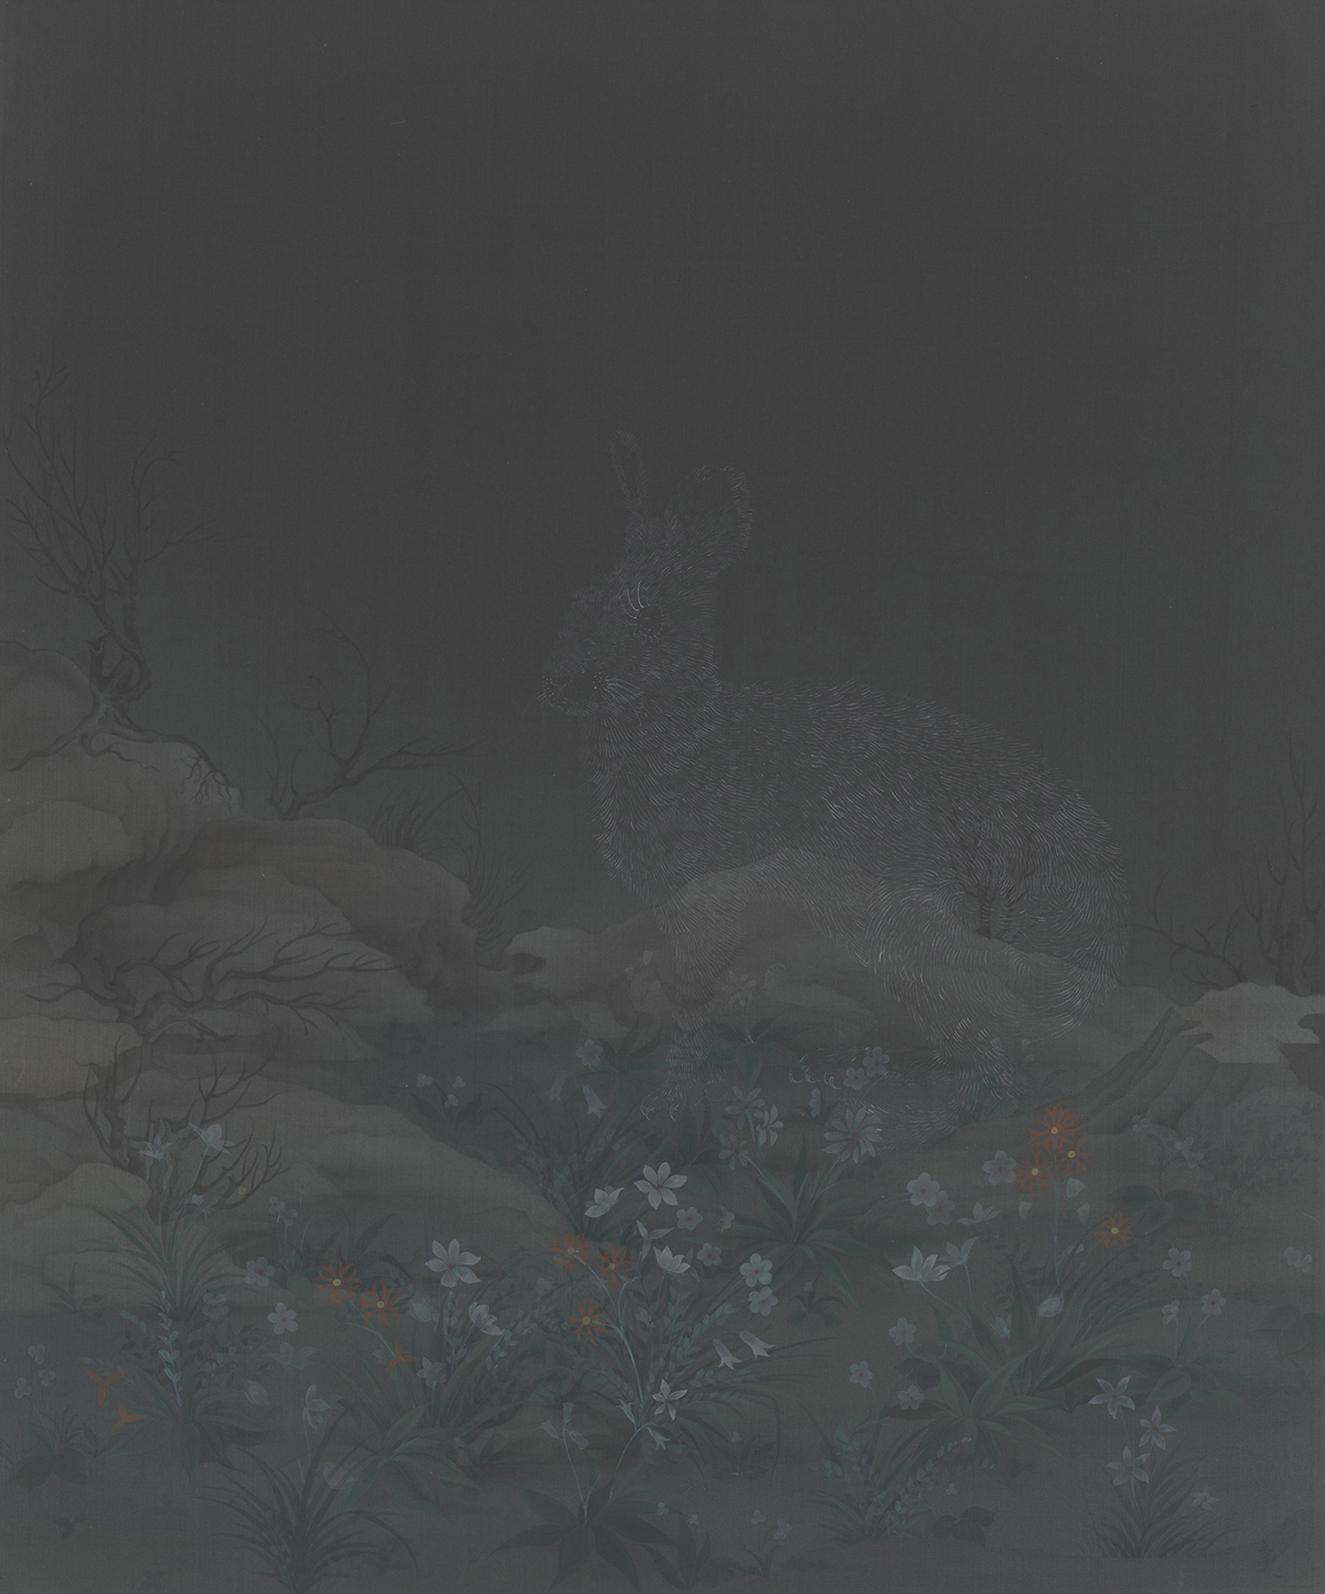 Hao Liang 郝量, Theology and Evolution 神学与进化论 (Left Panel 左), 2011, Ink and color on silk 绢本重彩, 72 x 86.5 cm